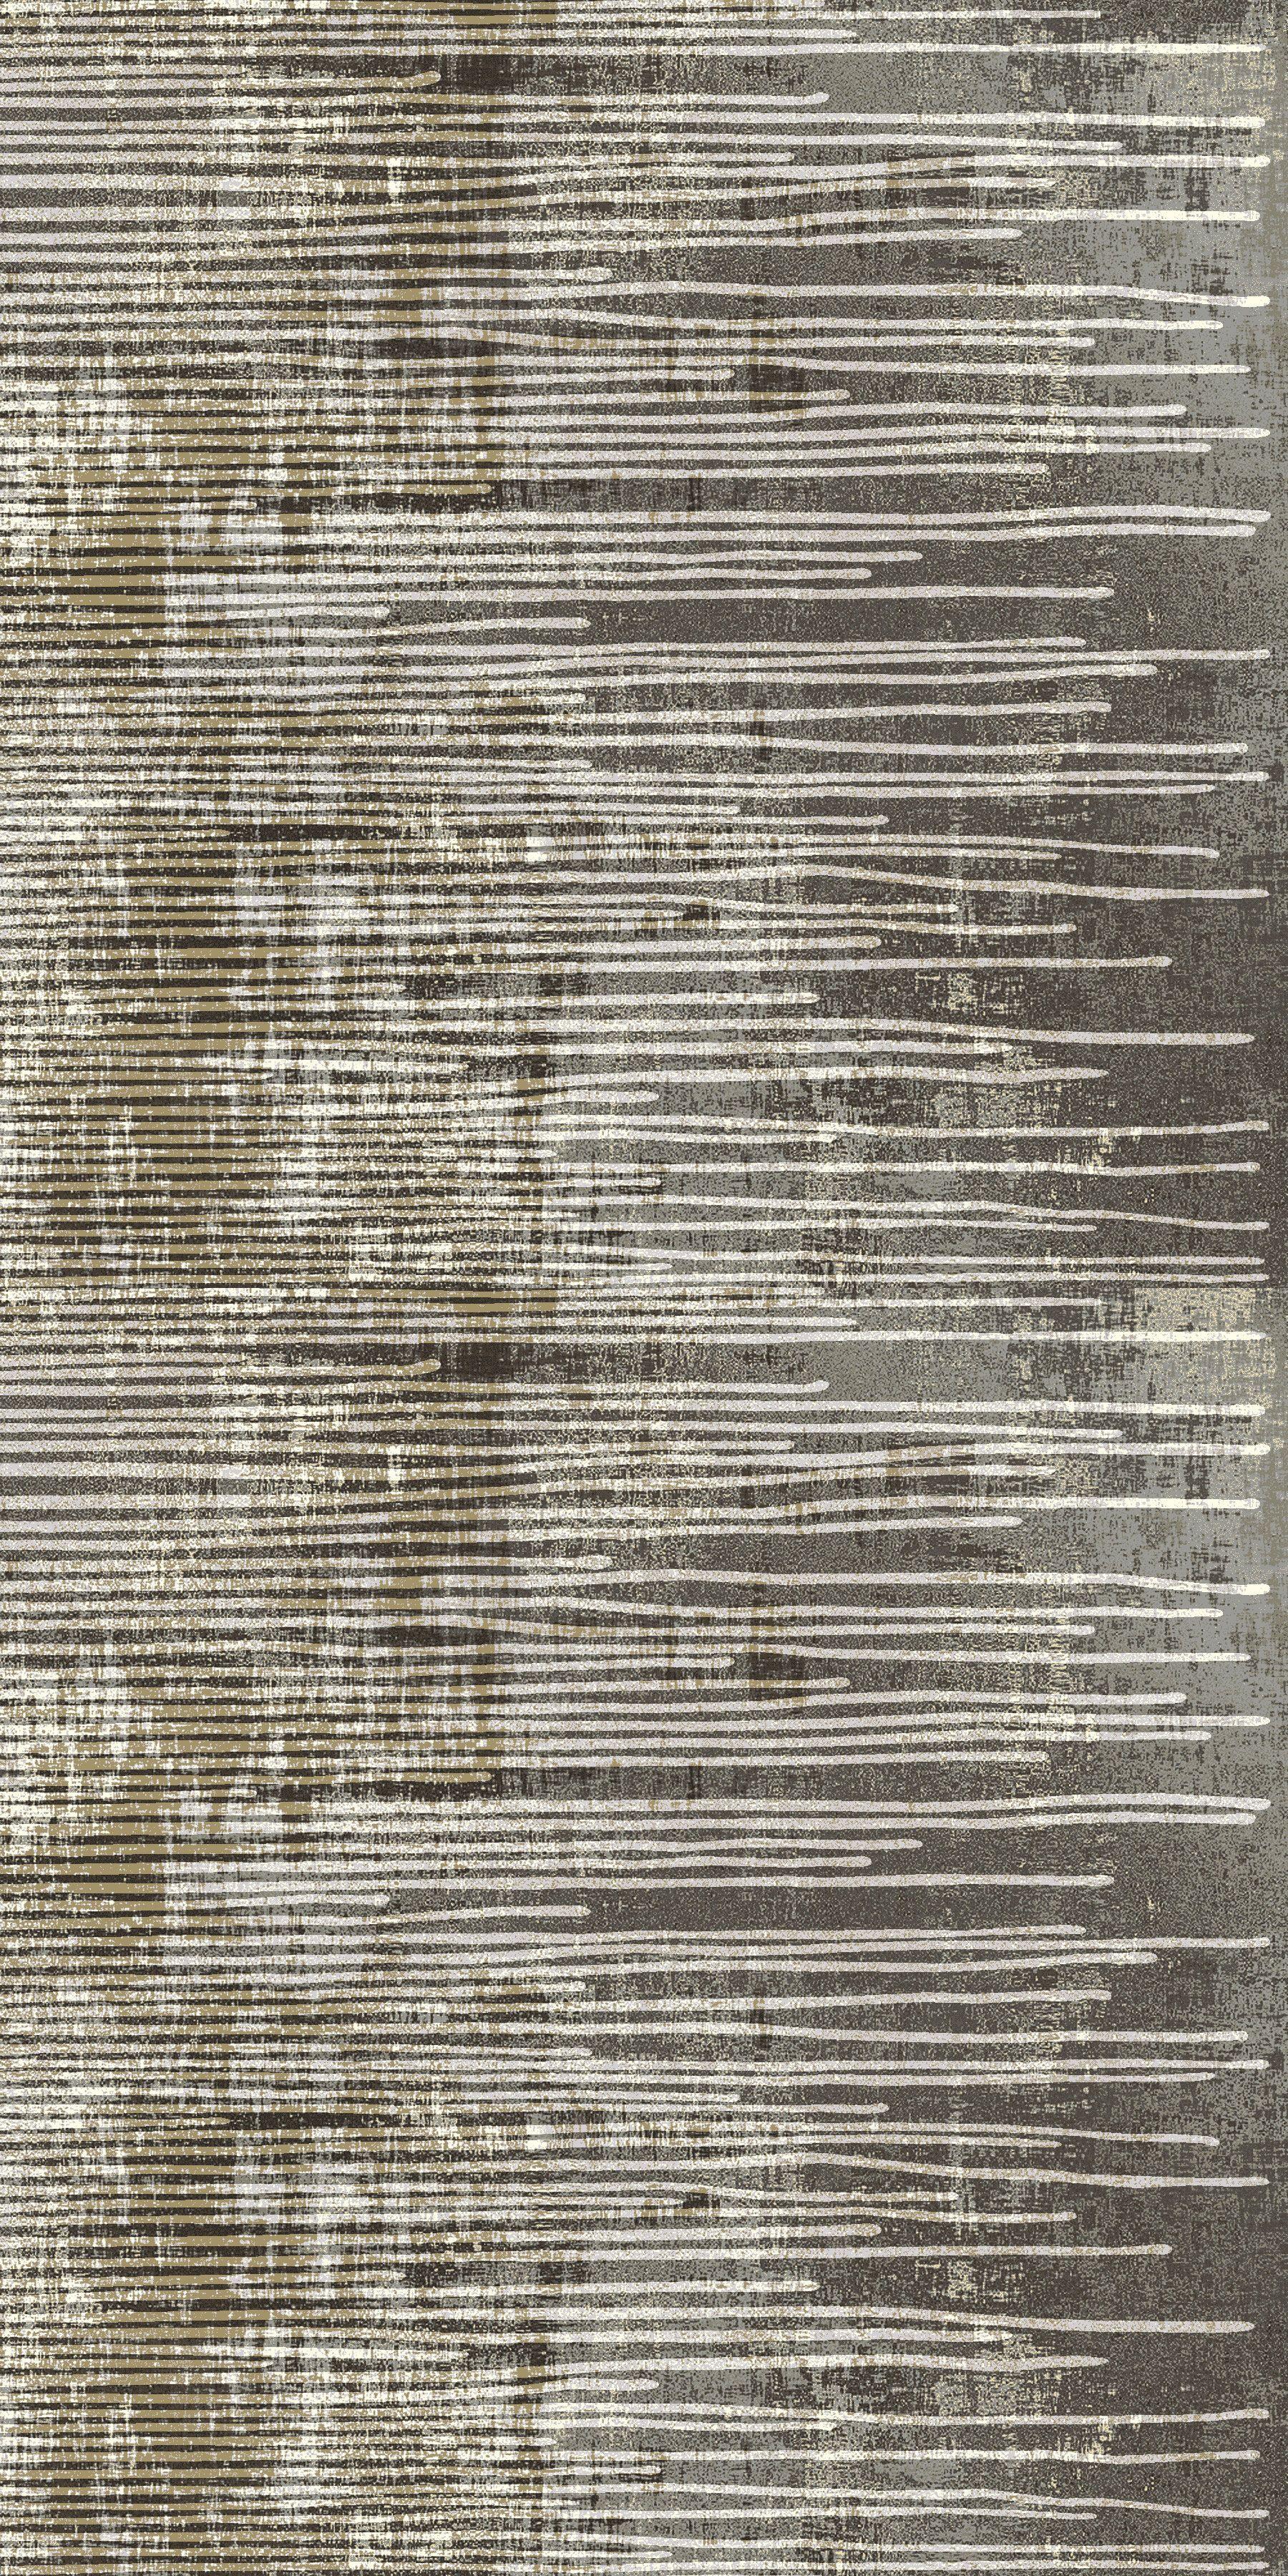 Durkan Pdi Precision Dye Injected Serefe Vriginia Langley Textured Carpet Buying Carpet Patterned Carpet